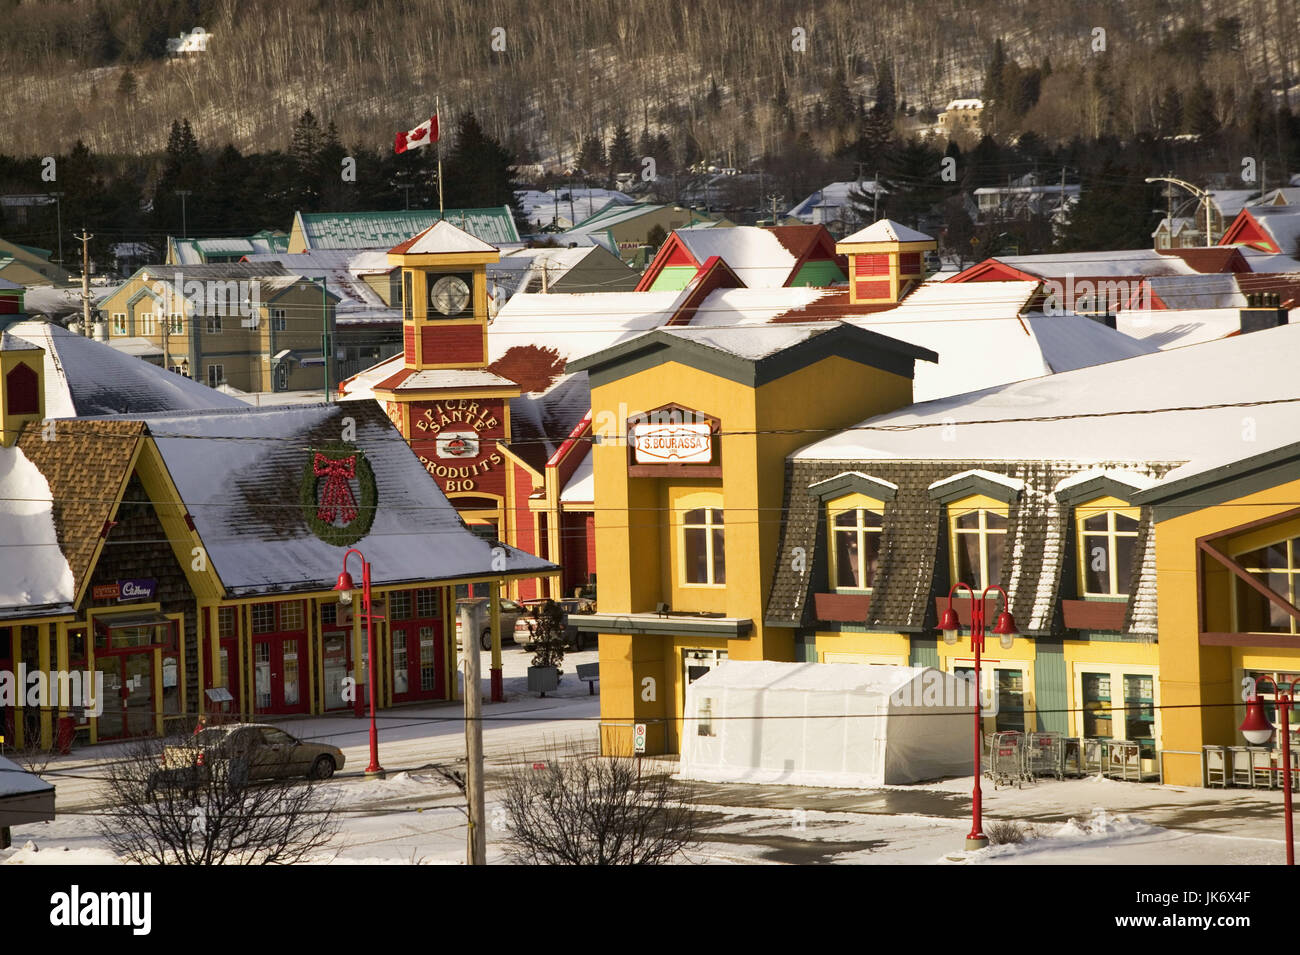 Kanada, Quebec, Laurentian Mountains, Saint-Sauveur, Stadtansicht, Winter   Nordamerika, Canada, Laurentian Highlands, - Stock Image